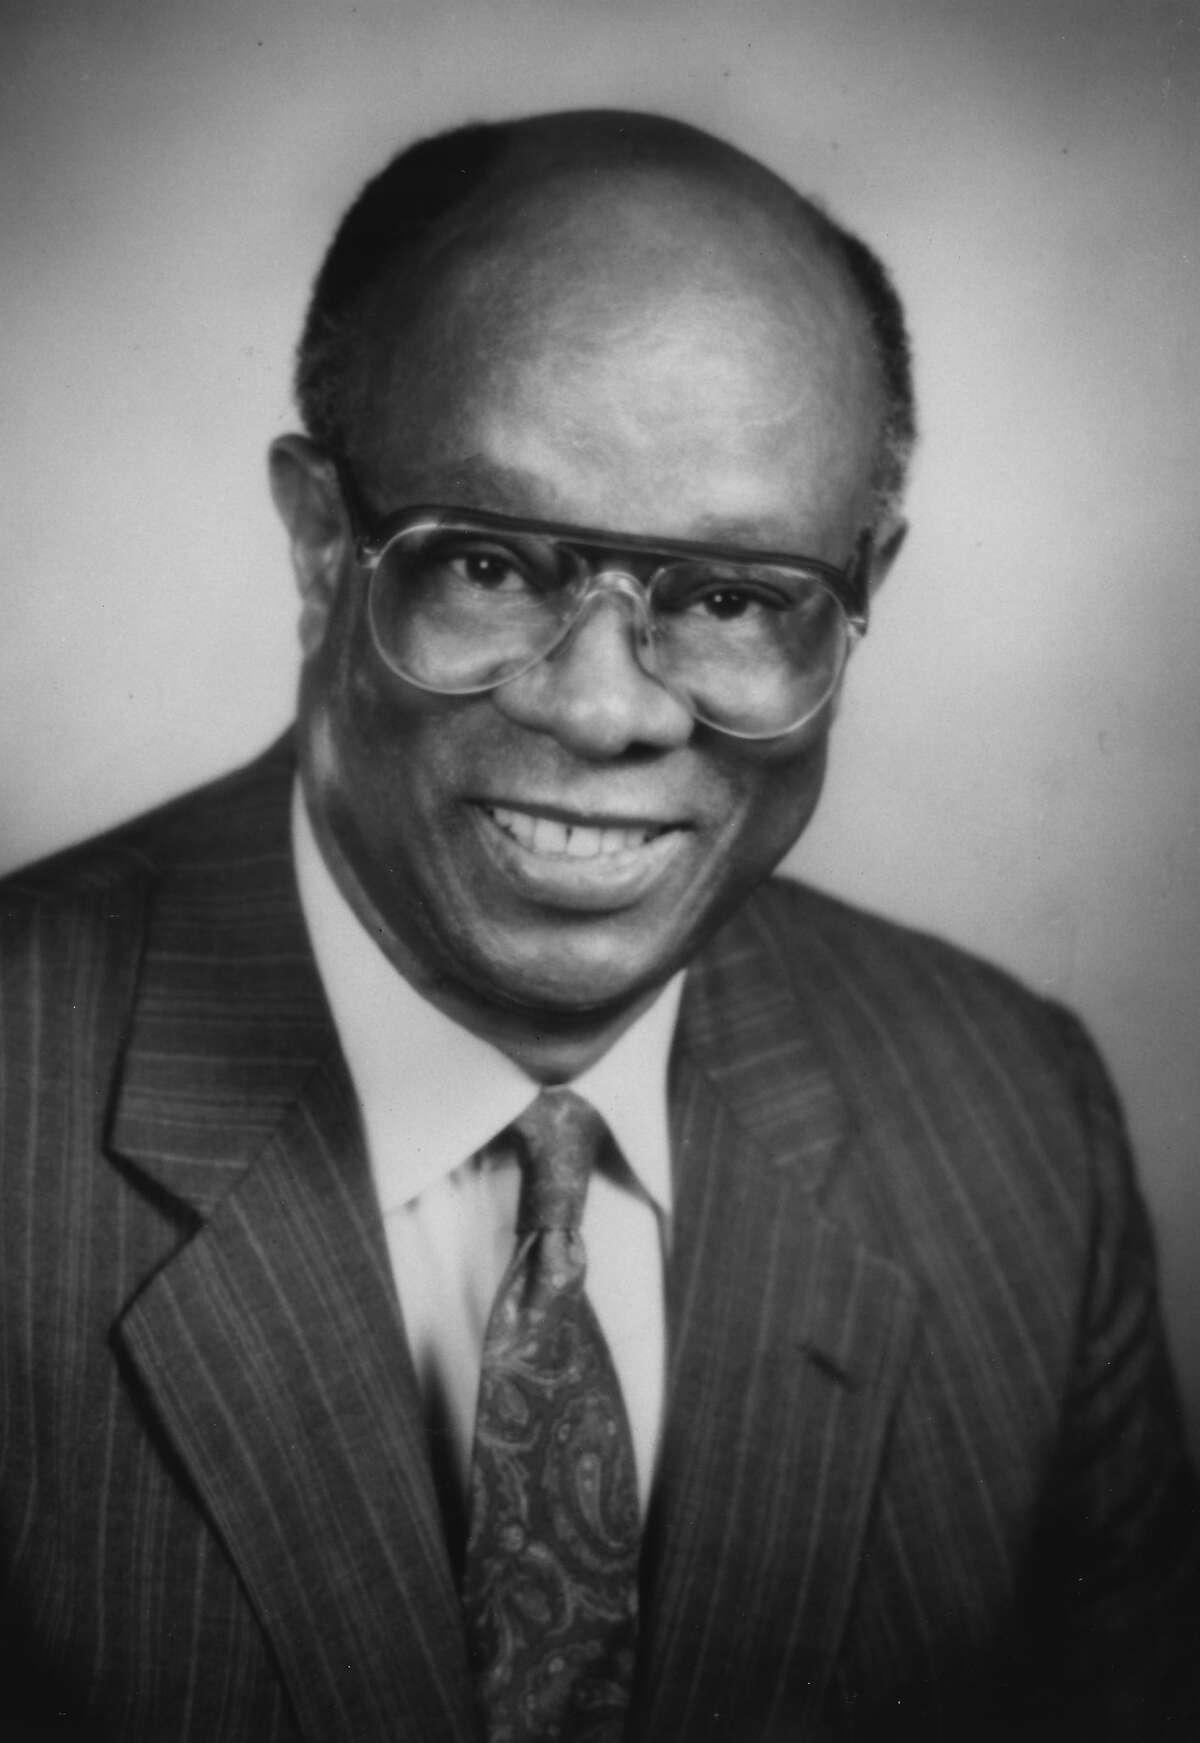 Former Trinity University urban studies professor Earl Lewis in 1988. Courtesy Trinity University.